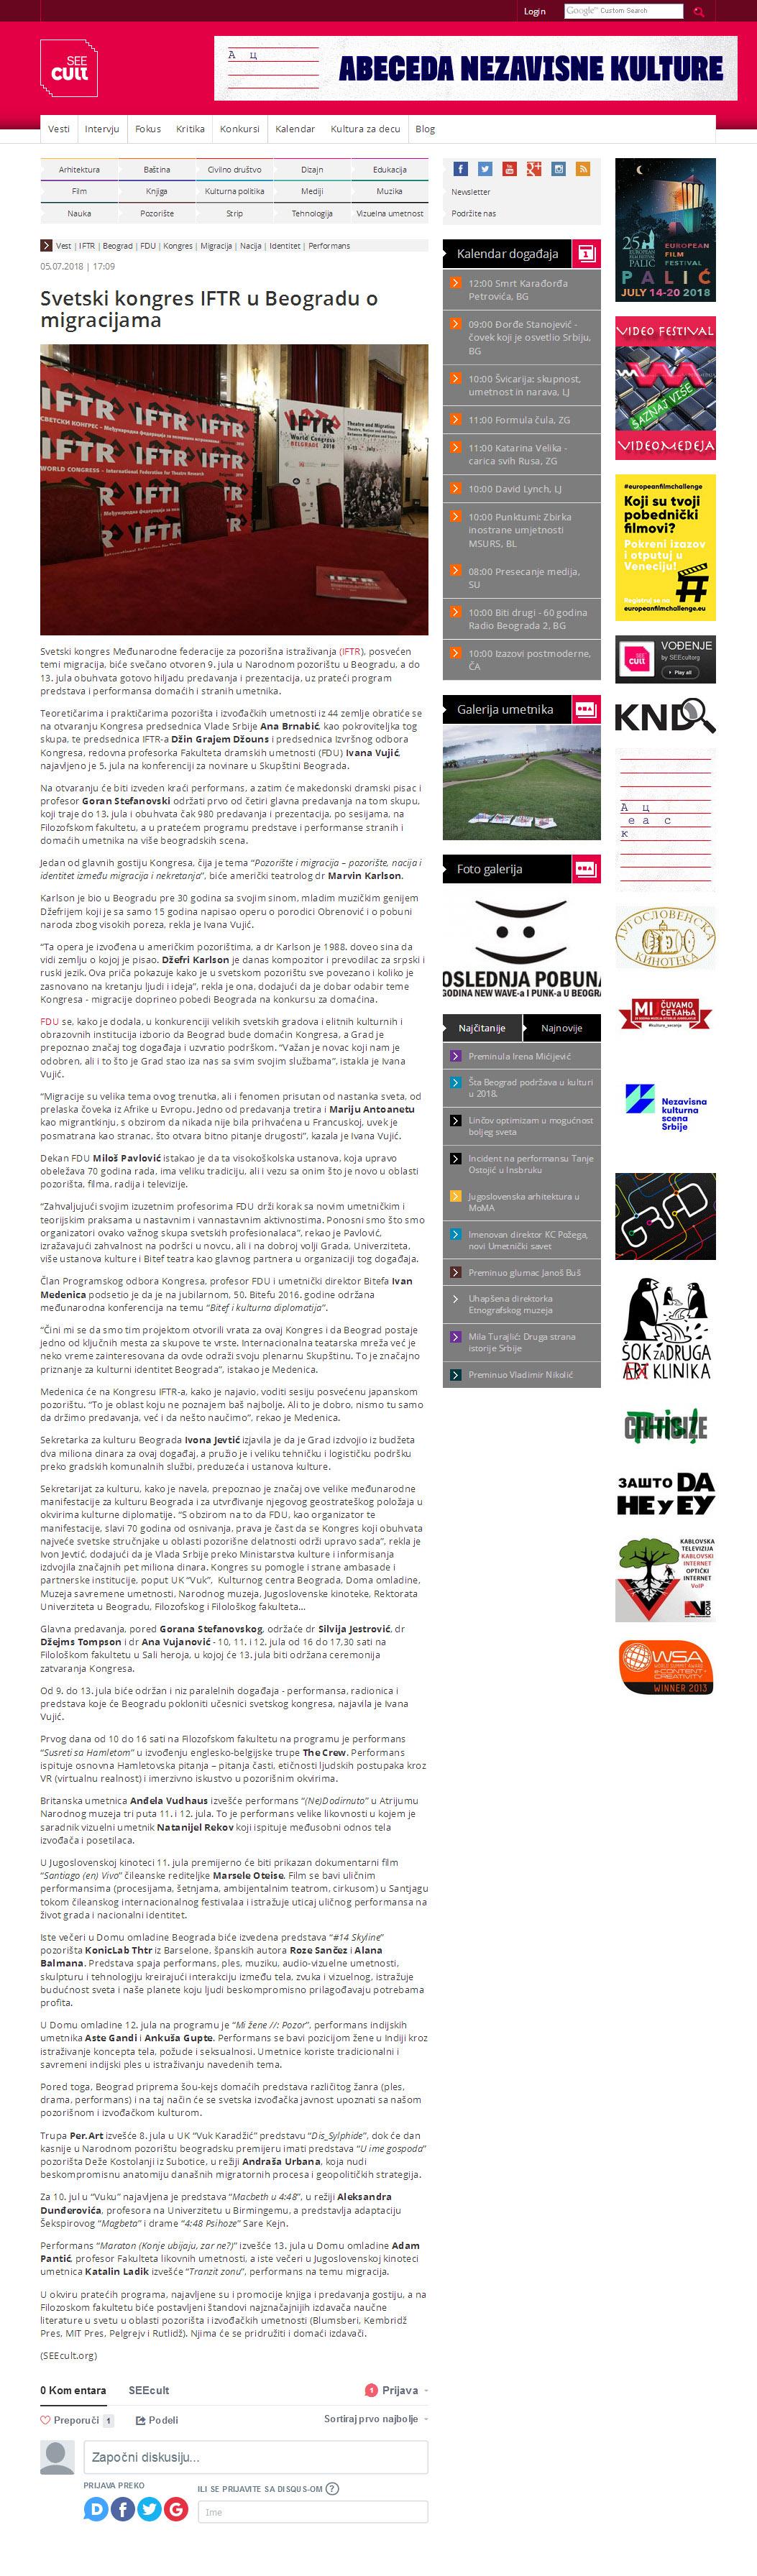 0507 - seecult.org - Svetski kongres IFTR u Beogradu o migracijama.jpg